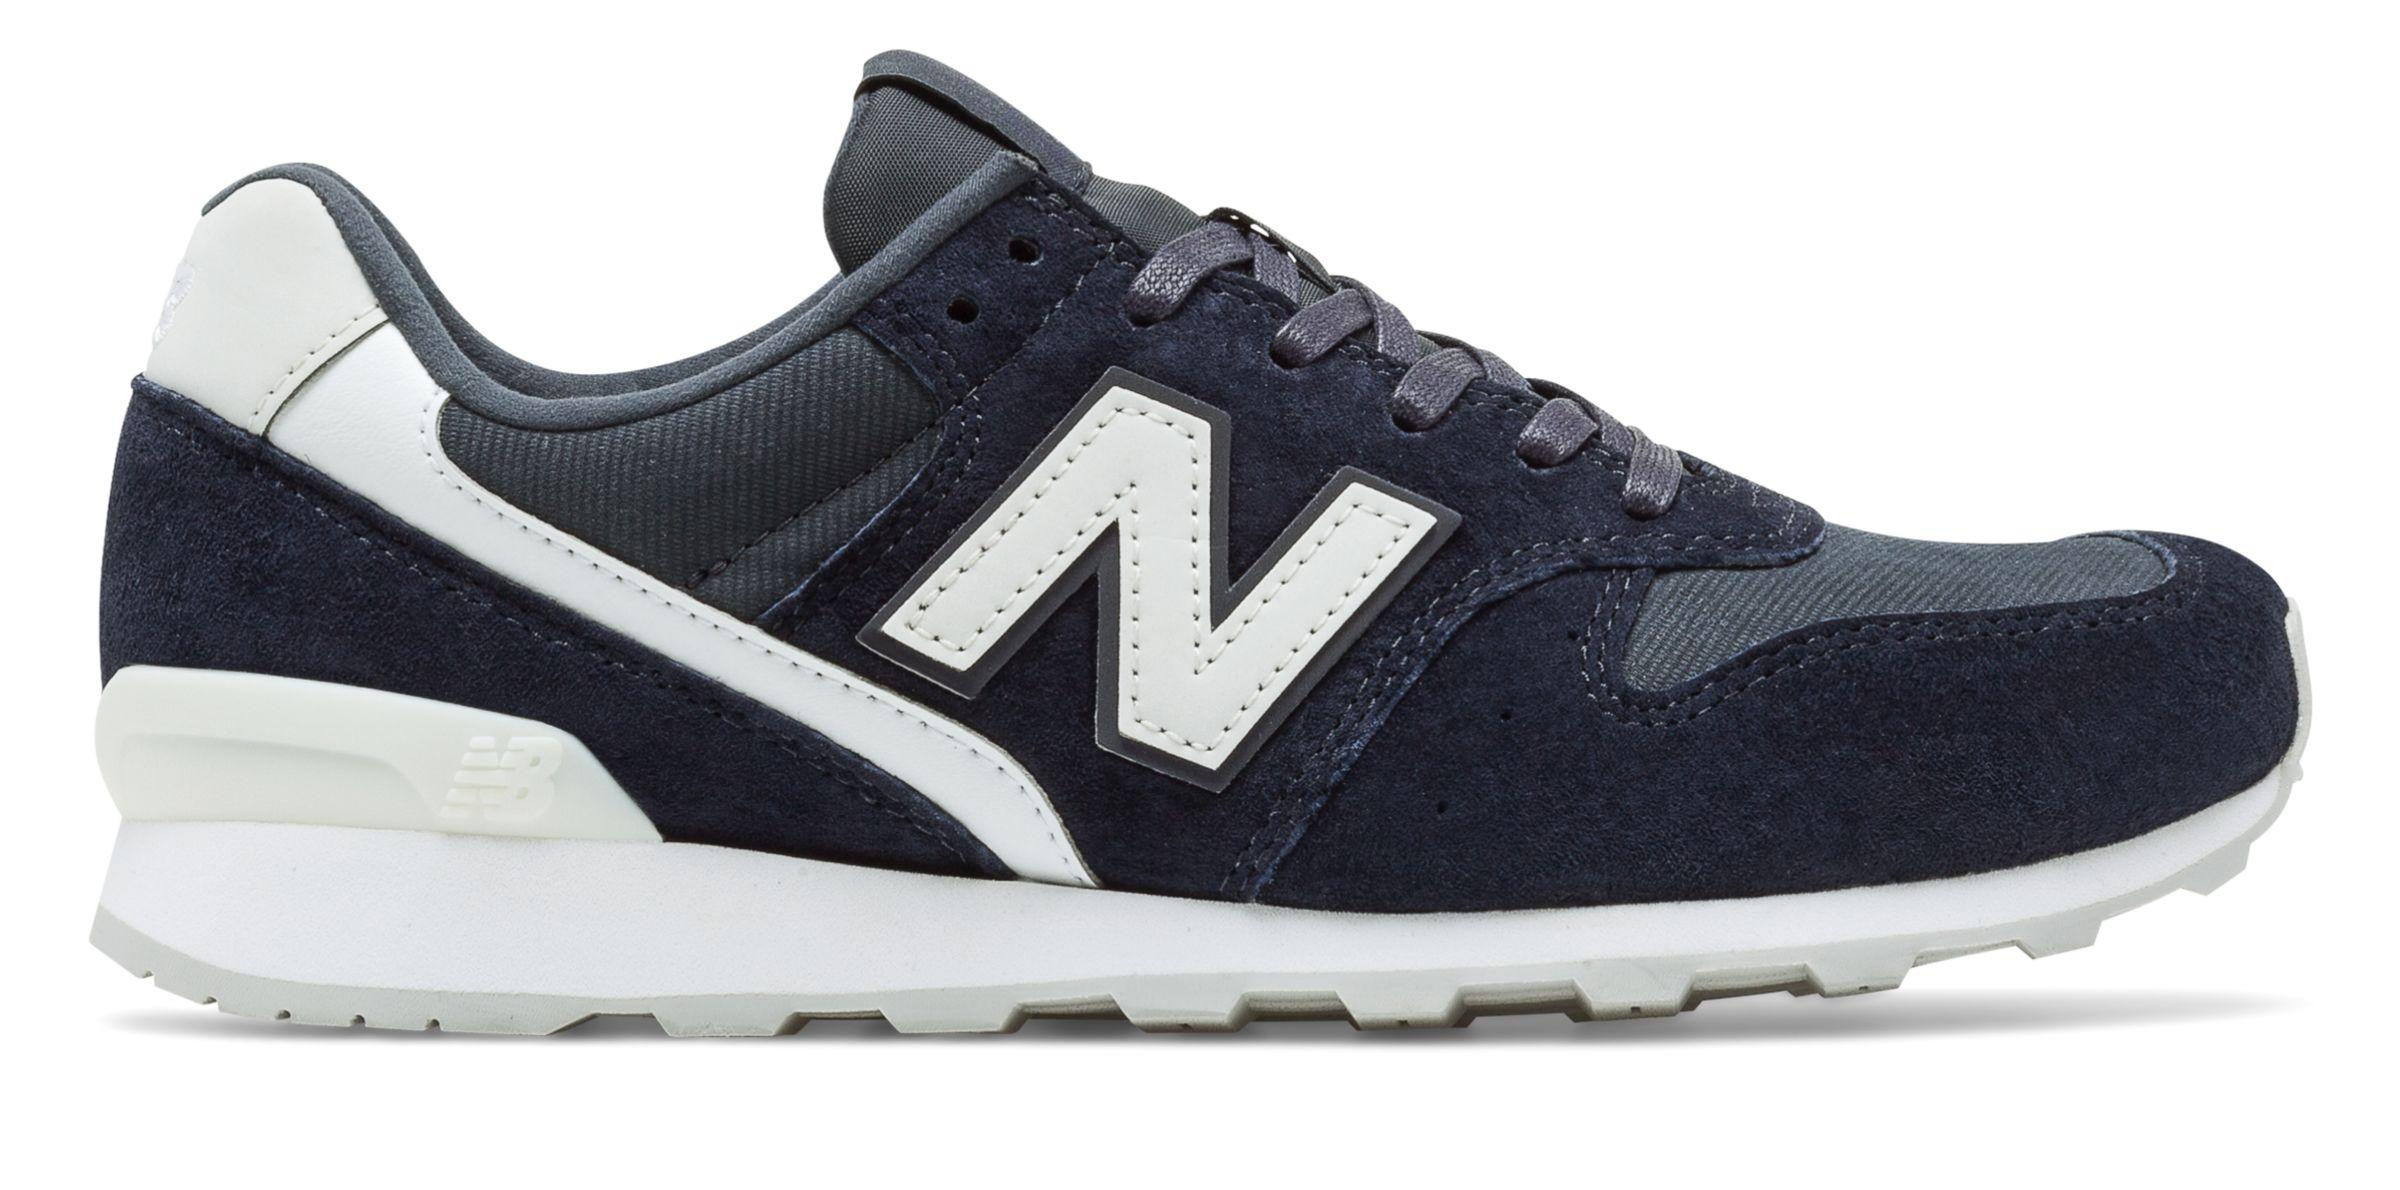 NB New Balance 996, Navy with Grey